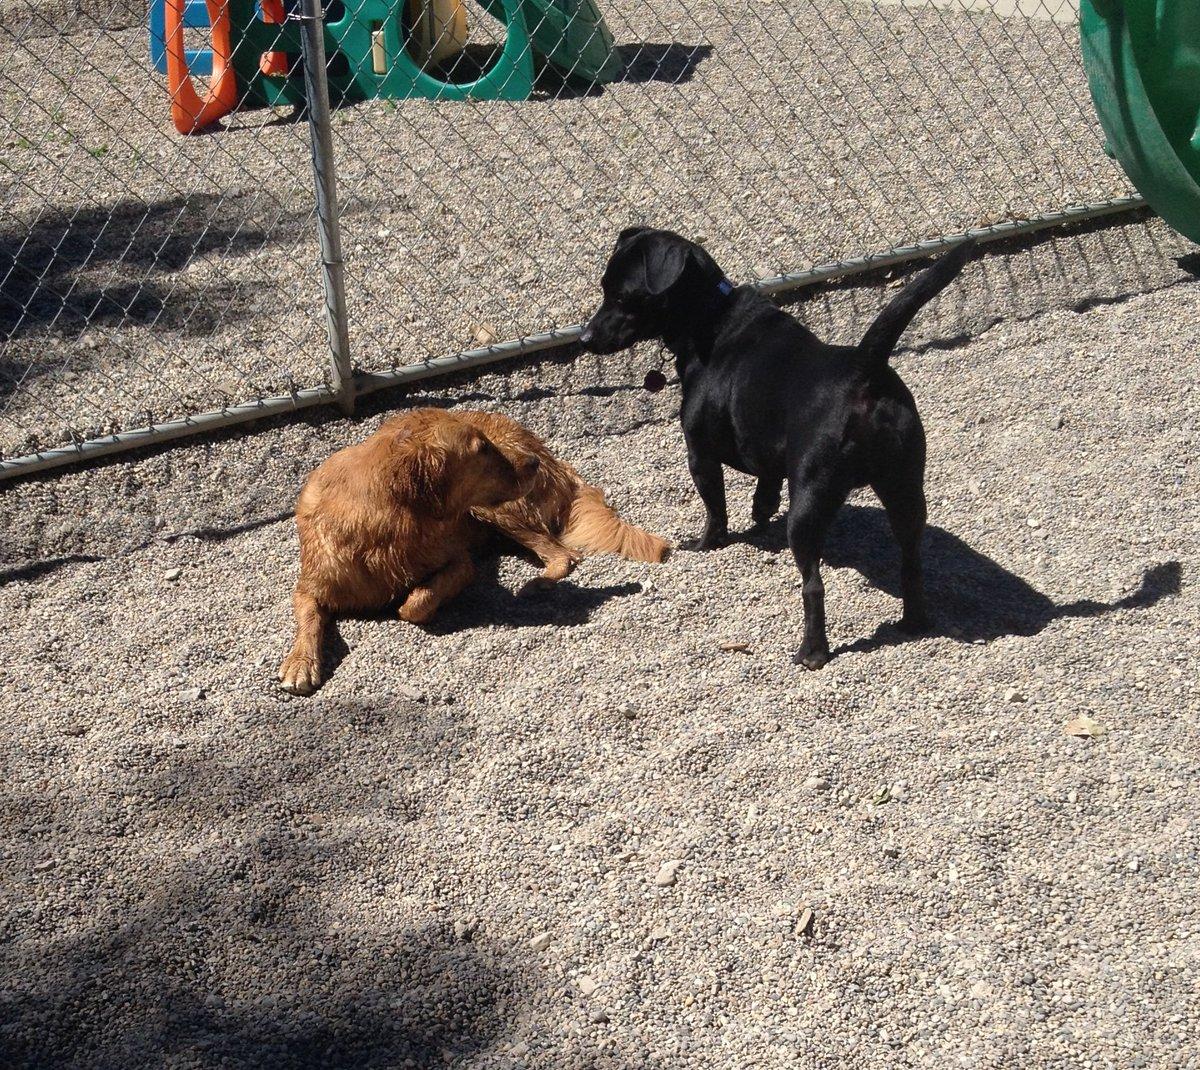 Otis says hi to his friend Maggie Mae